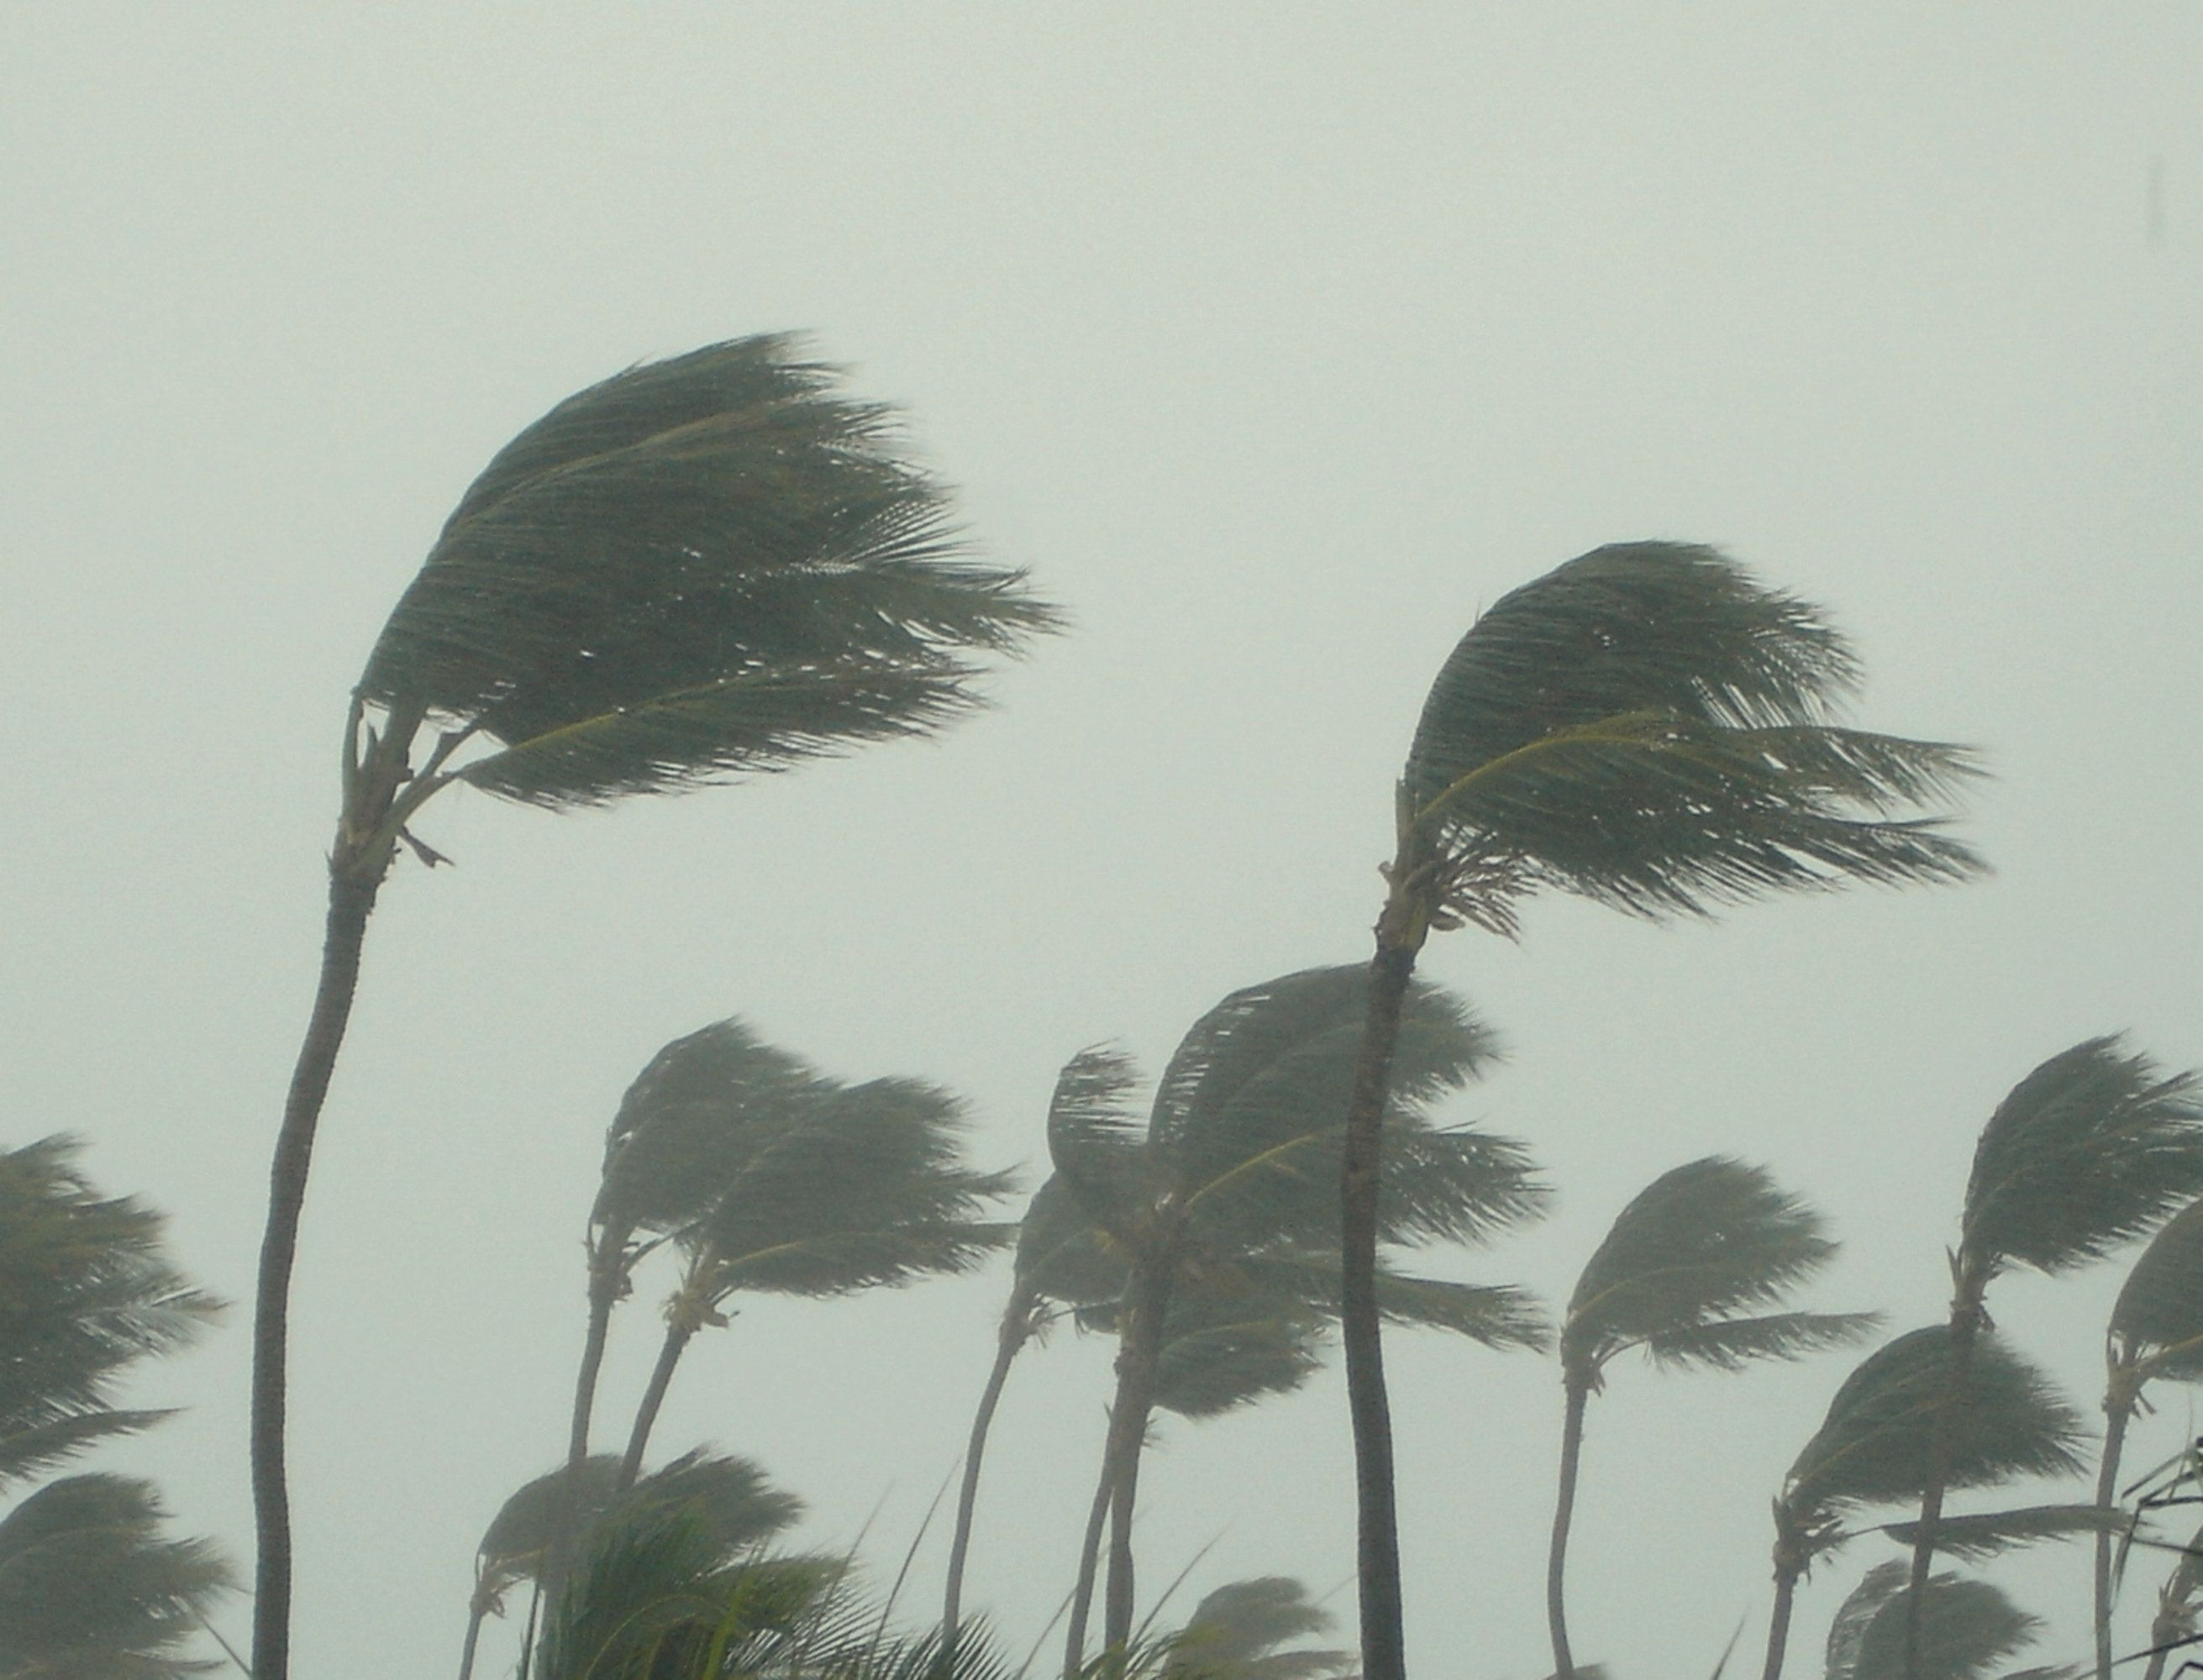 Non, la Tunisie ne sera pas touchée par un cyclone tropical selon